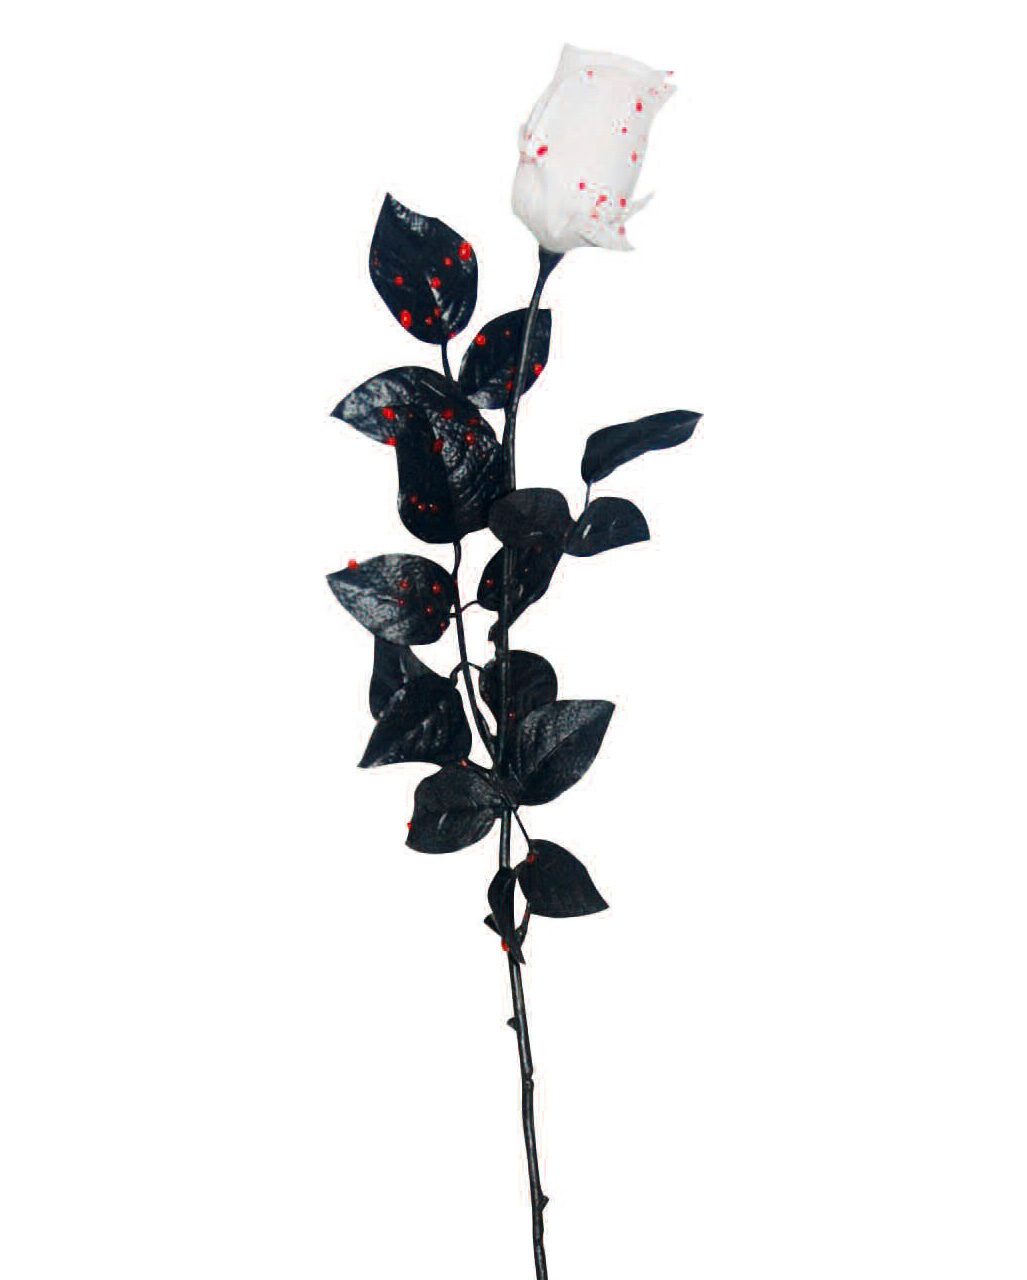 Black or White Bloody Rose Halloween Fancy Dress Prop Accessory